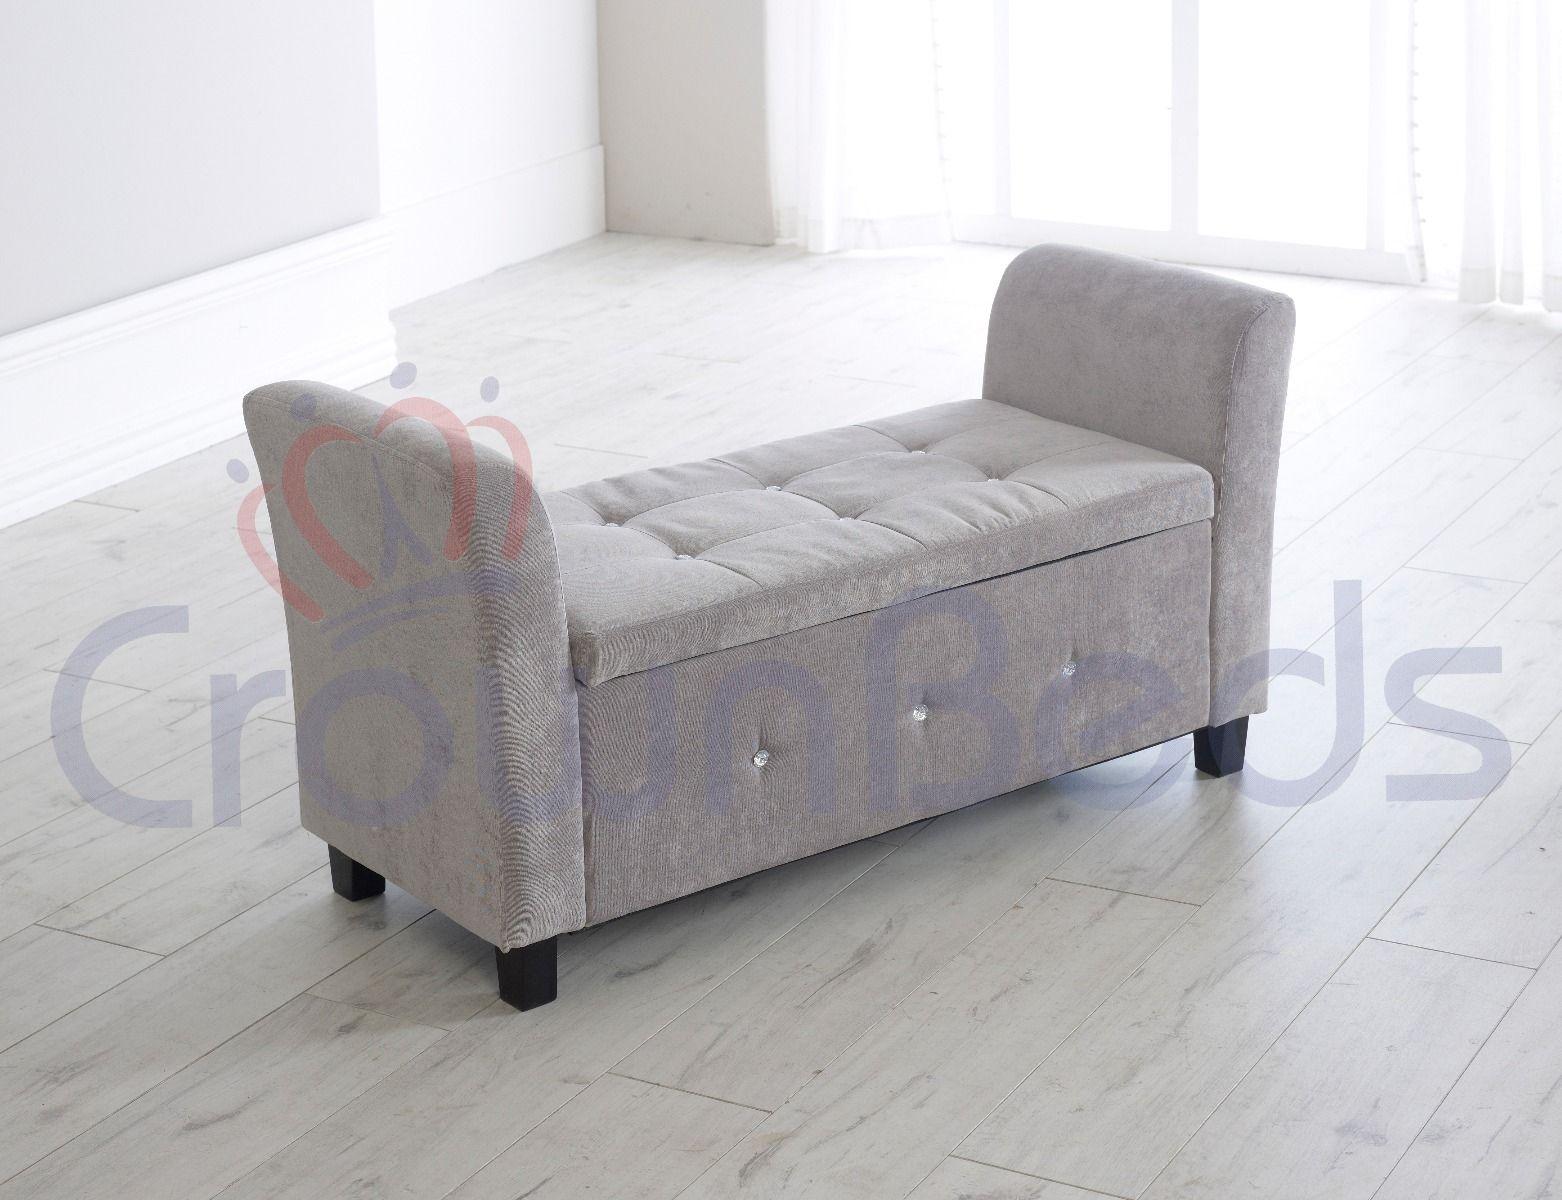 paris plush velvet ottoman storage box with resting arms silver